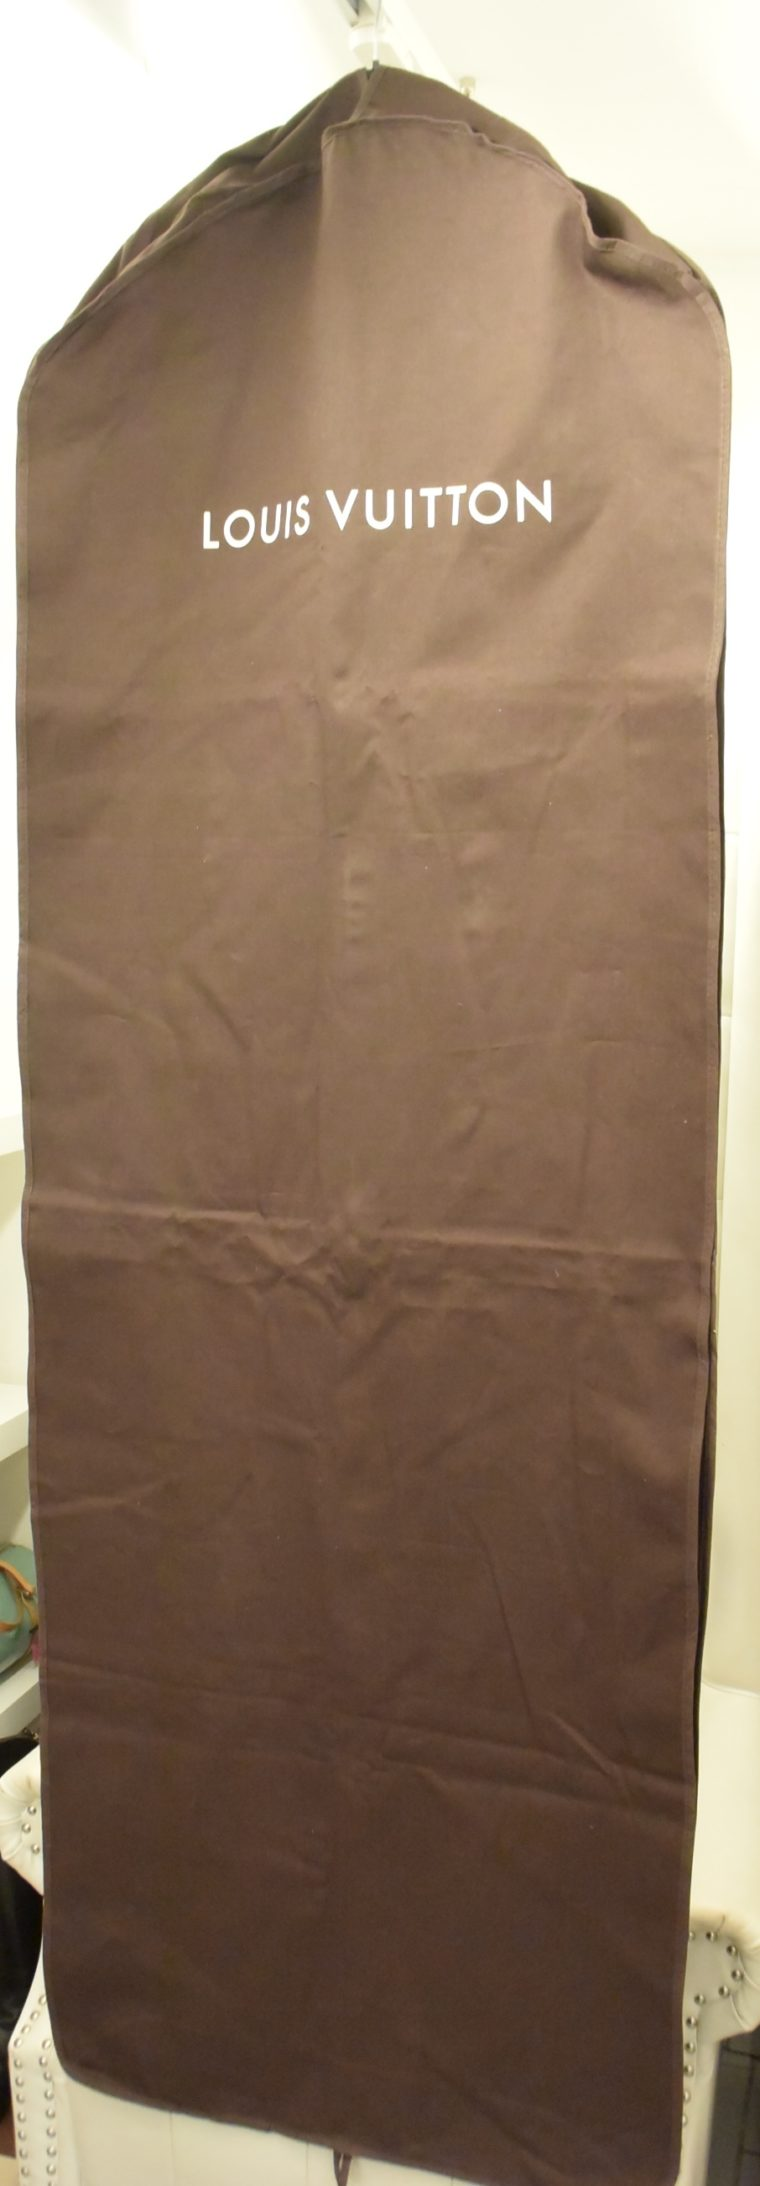 Louis Vuitton Kleiderhülle Kleidersack braun lang-0